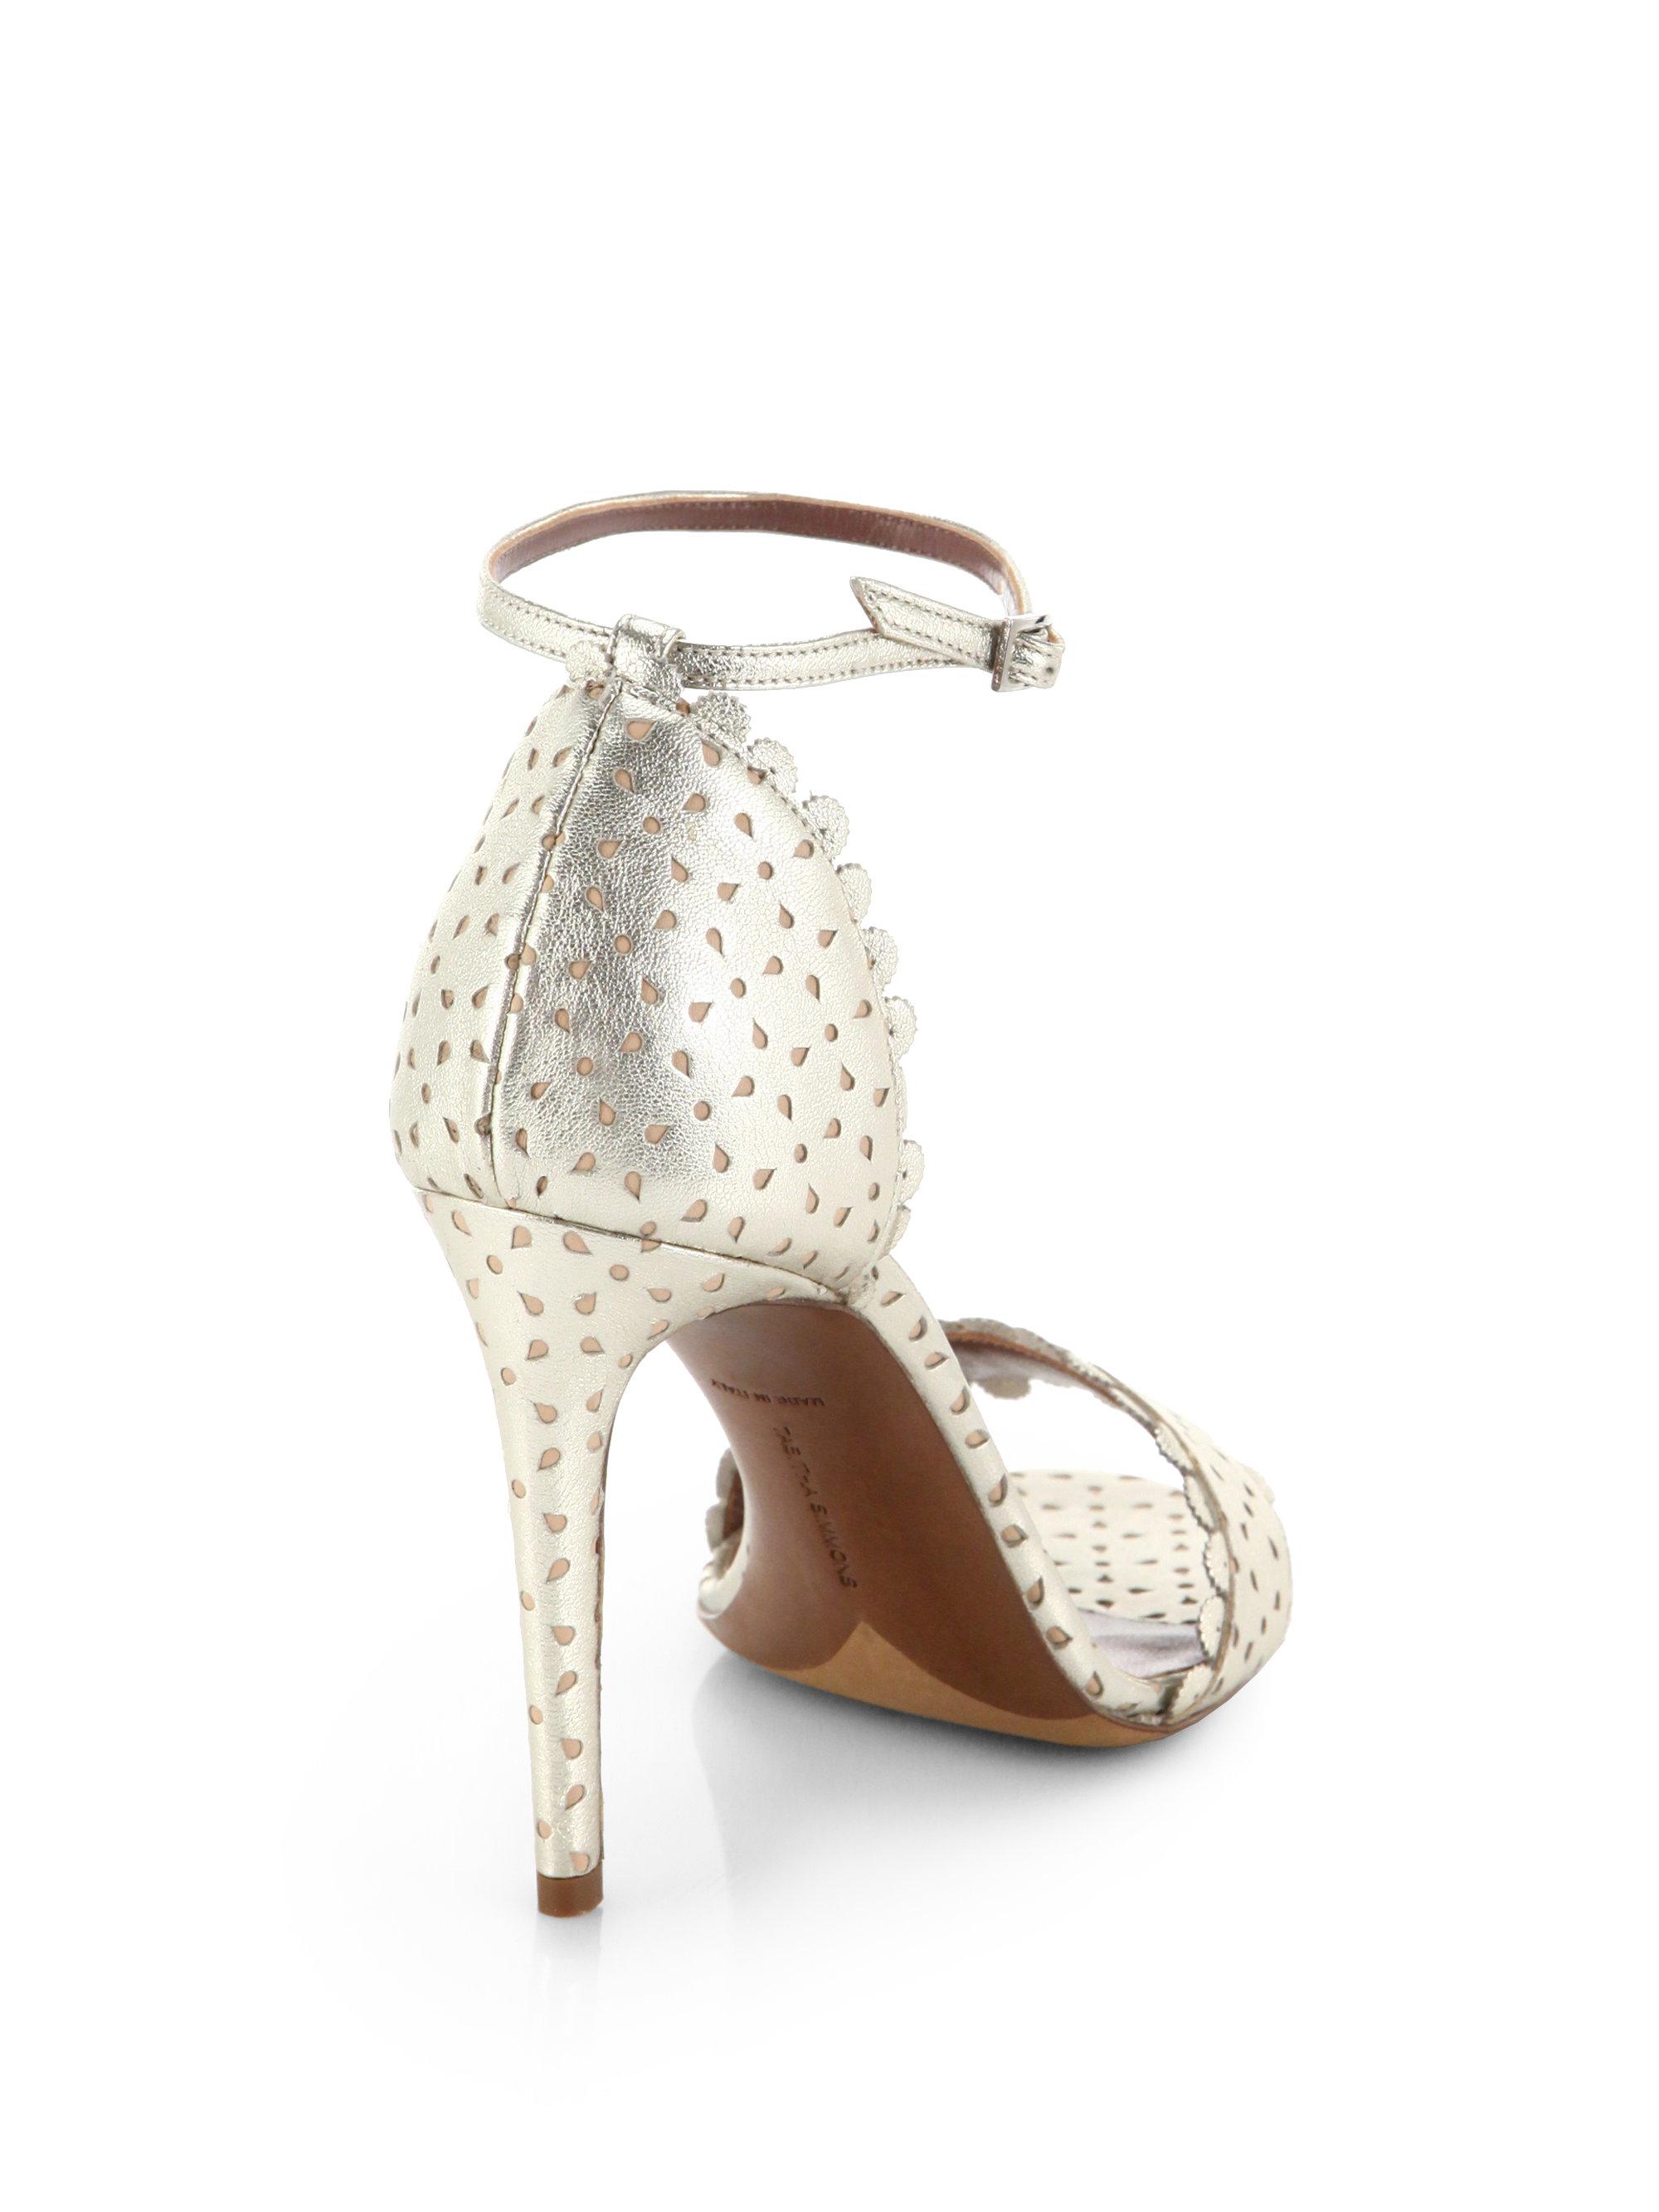 Carlos by Carlos Santana heeled sandal sz 8 In great